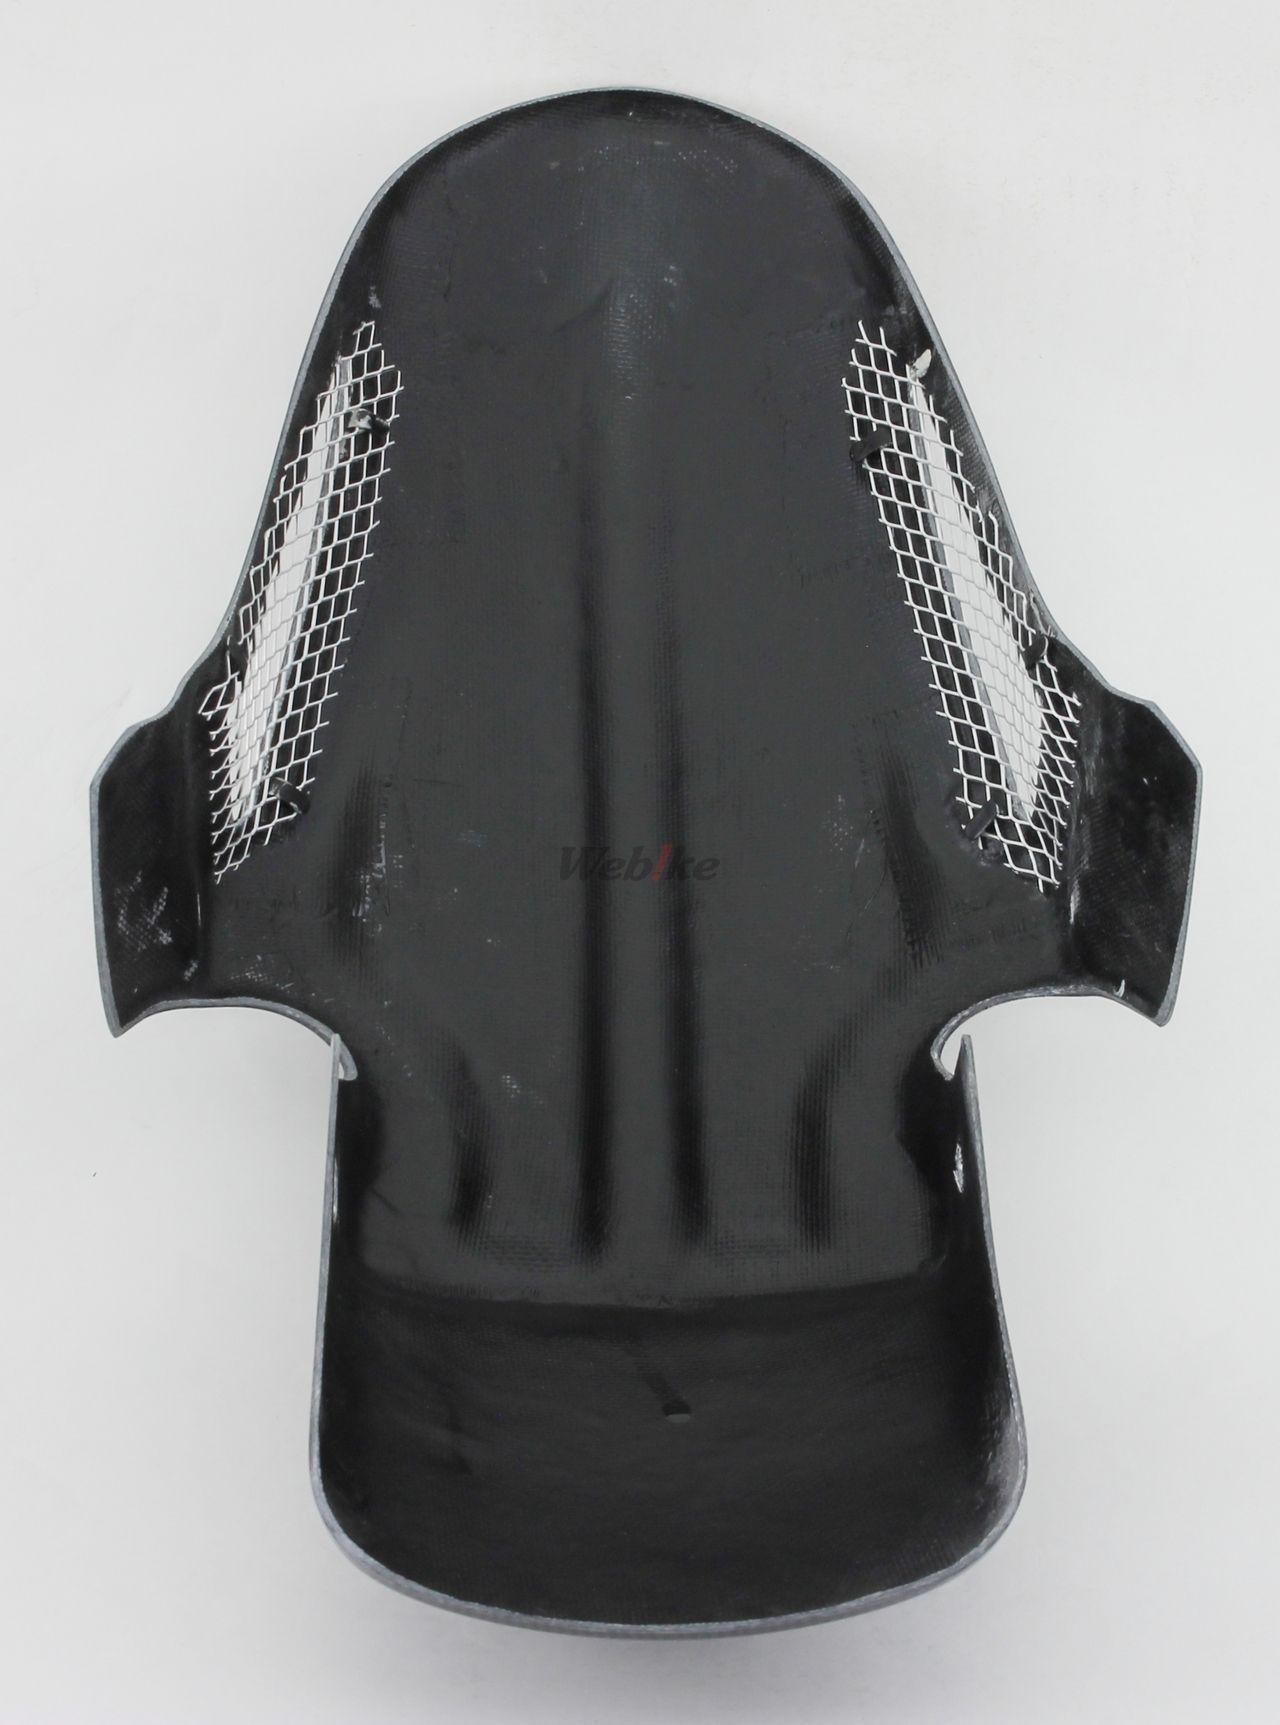 【POSH】3D-TECH 前土除 - 「Webike-摩托百貨」